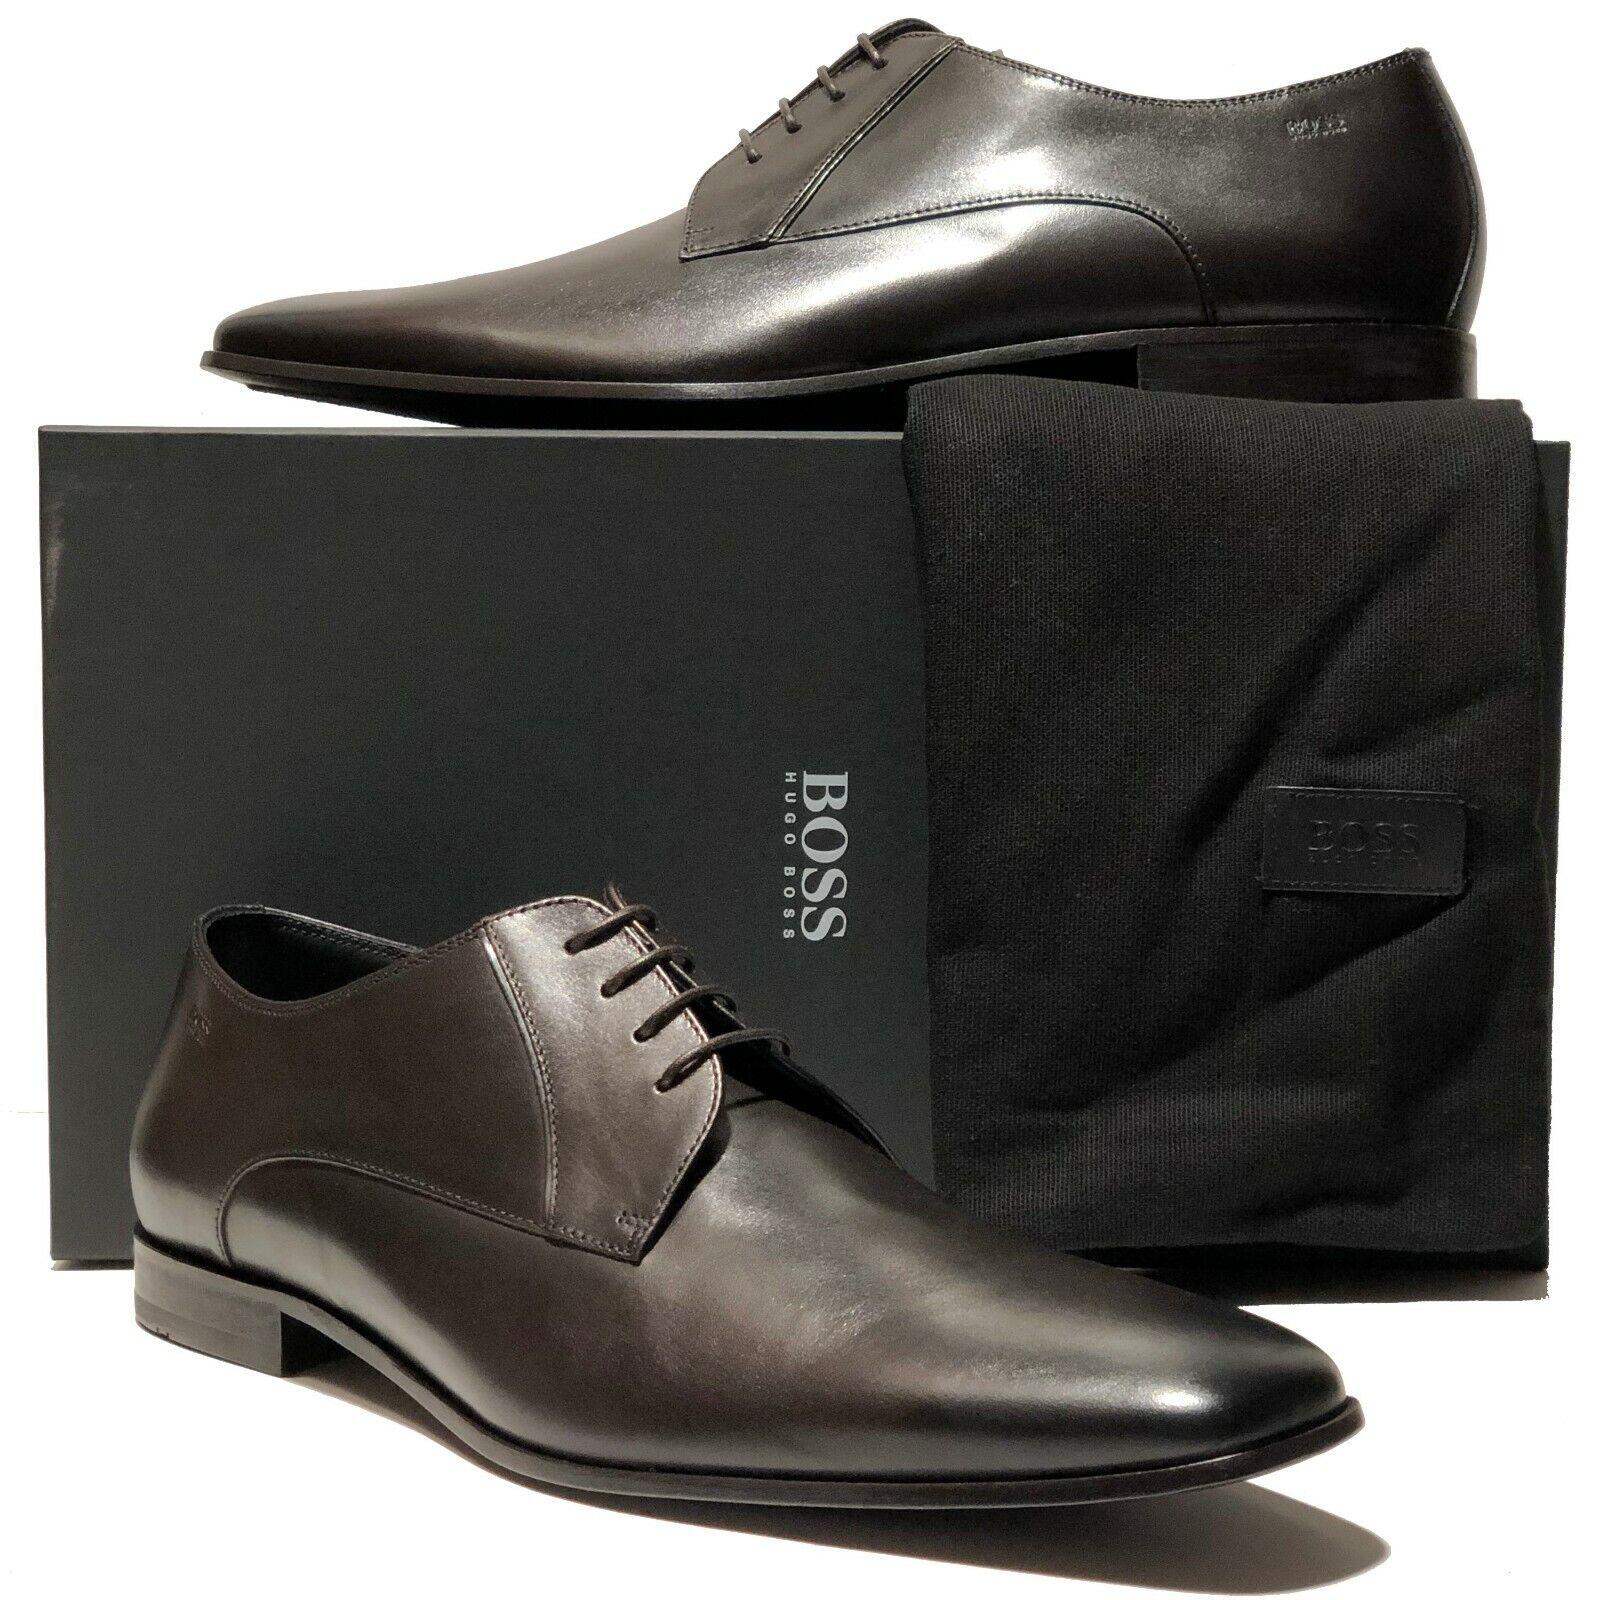 HUGO BOSS ITALY Dark Marroneee Leather 11 44 Men's Fashion Oxford Dress Derby Casual